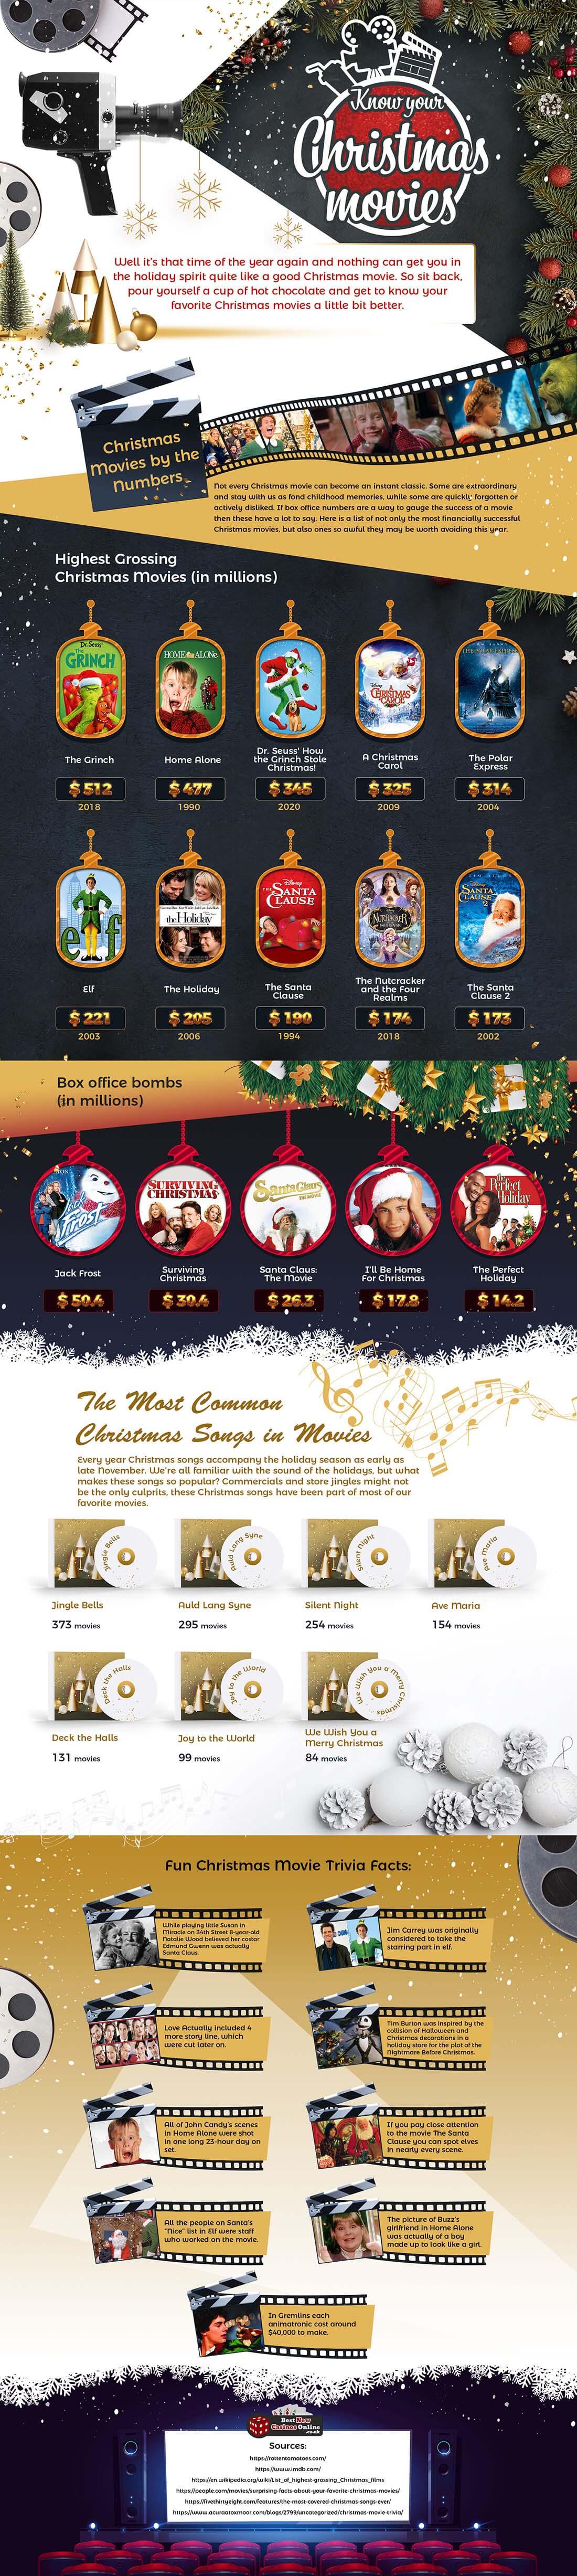 Know Your Favorite Christmas Movies